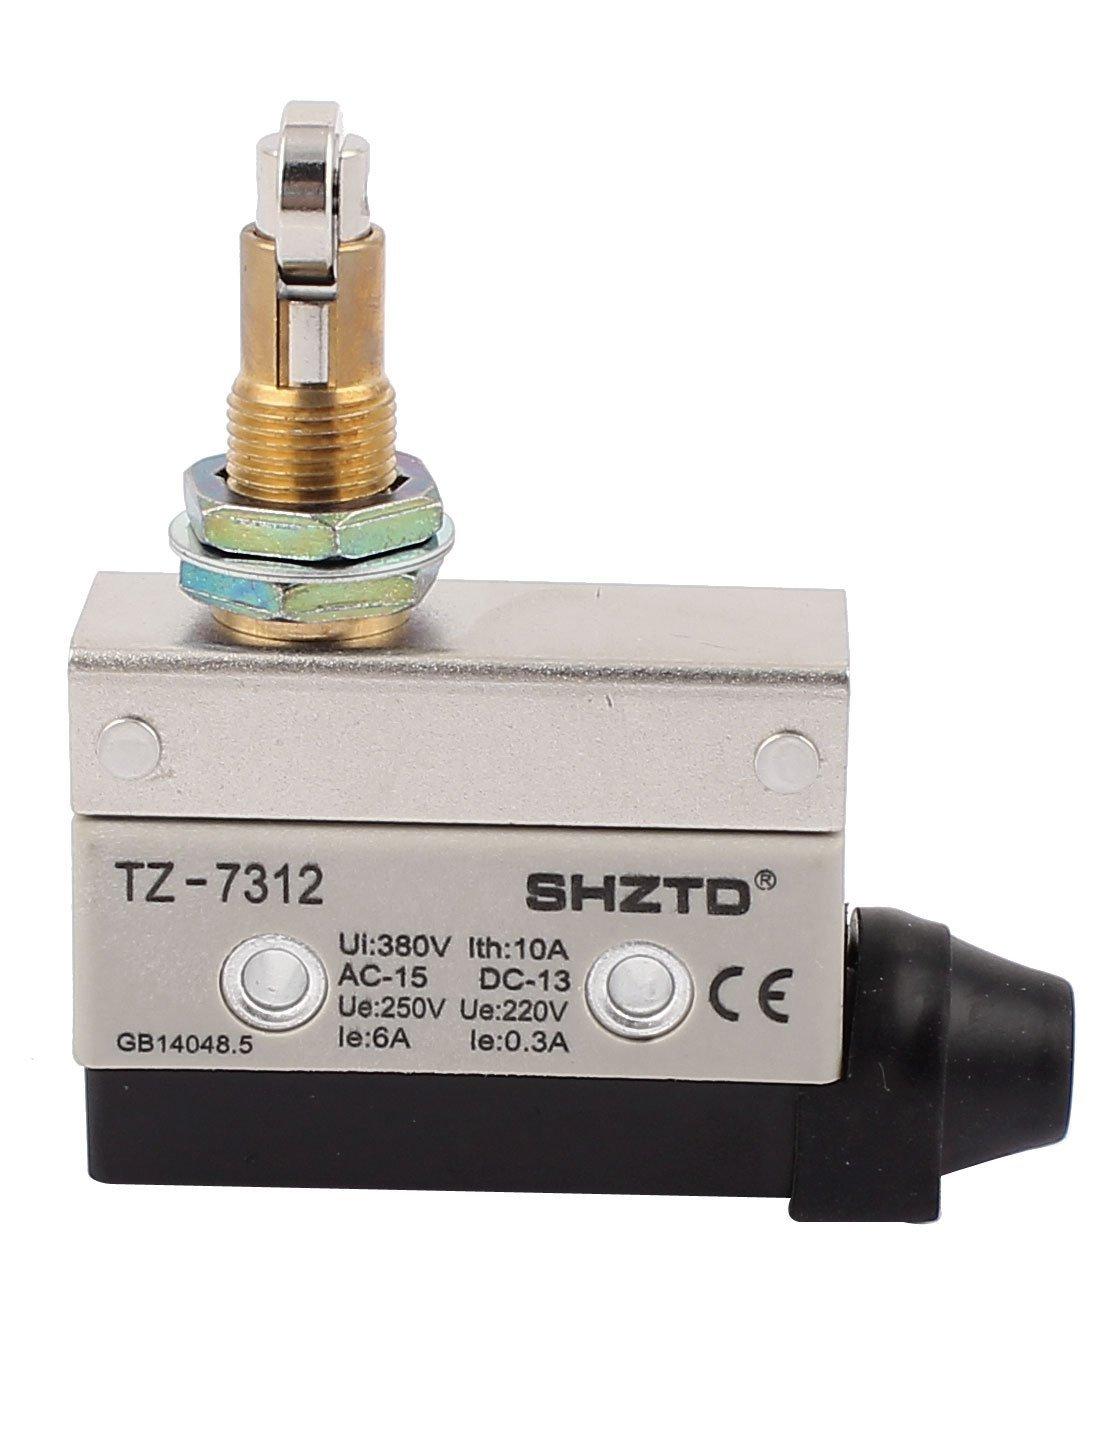 DealMux AC 380V 10A SPDT 1NO+1NC Snap Action Roller Plunger Limit Switch